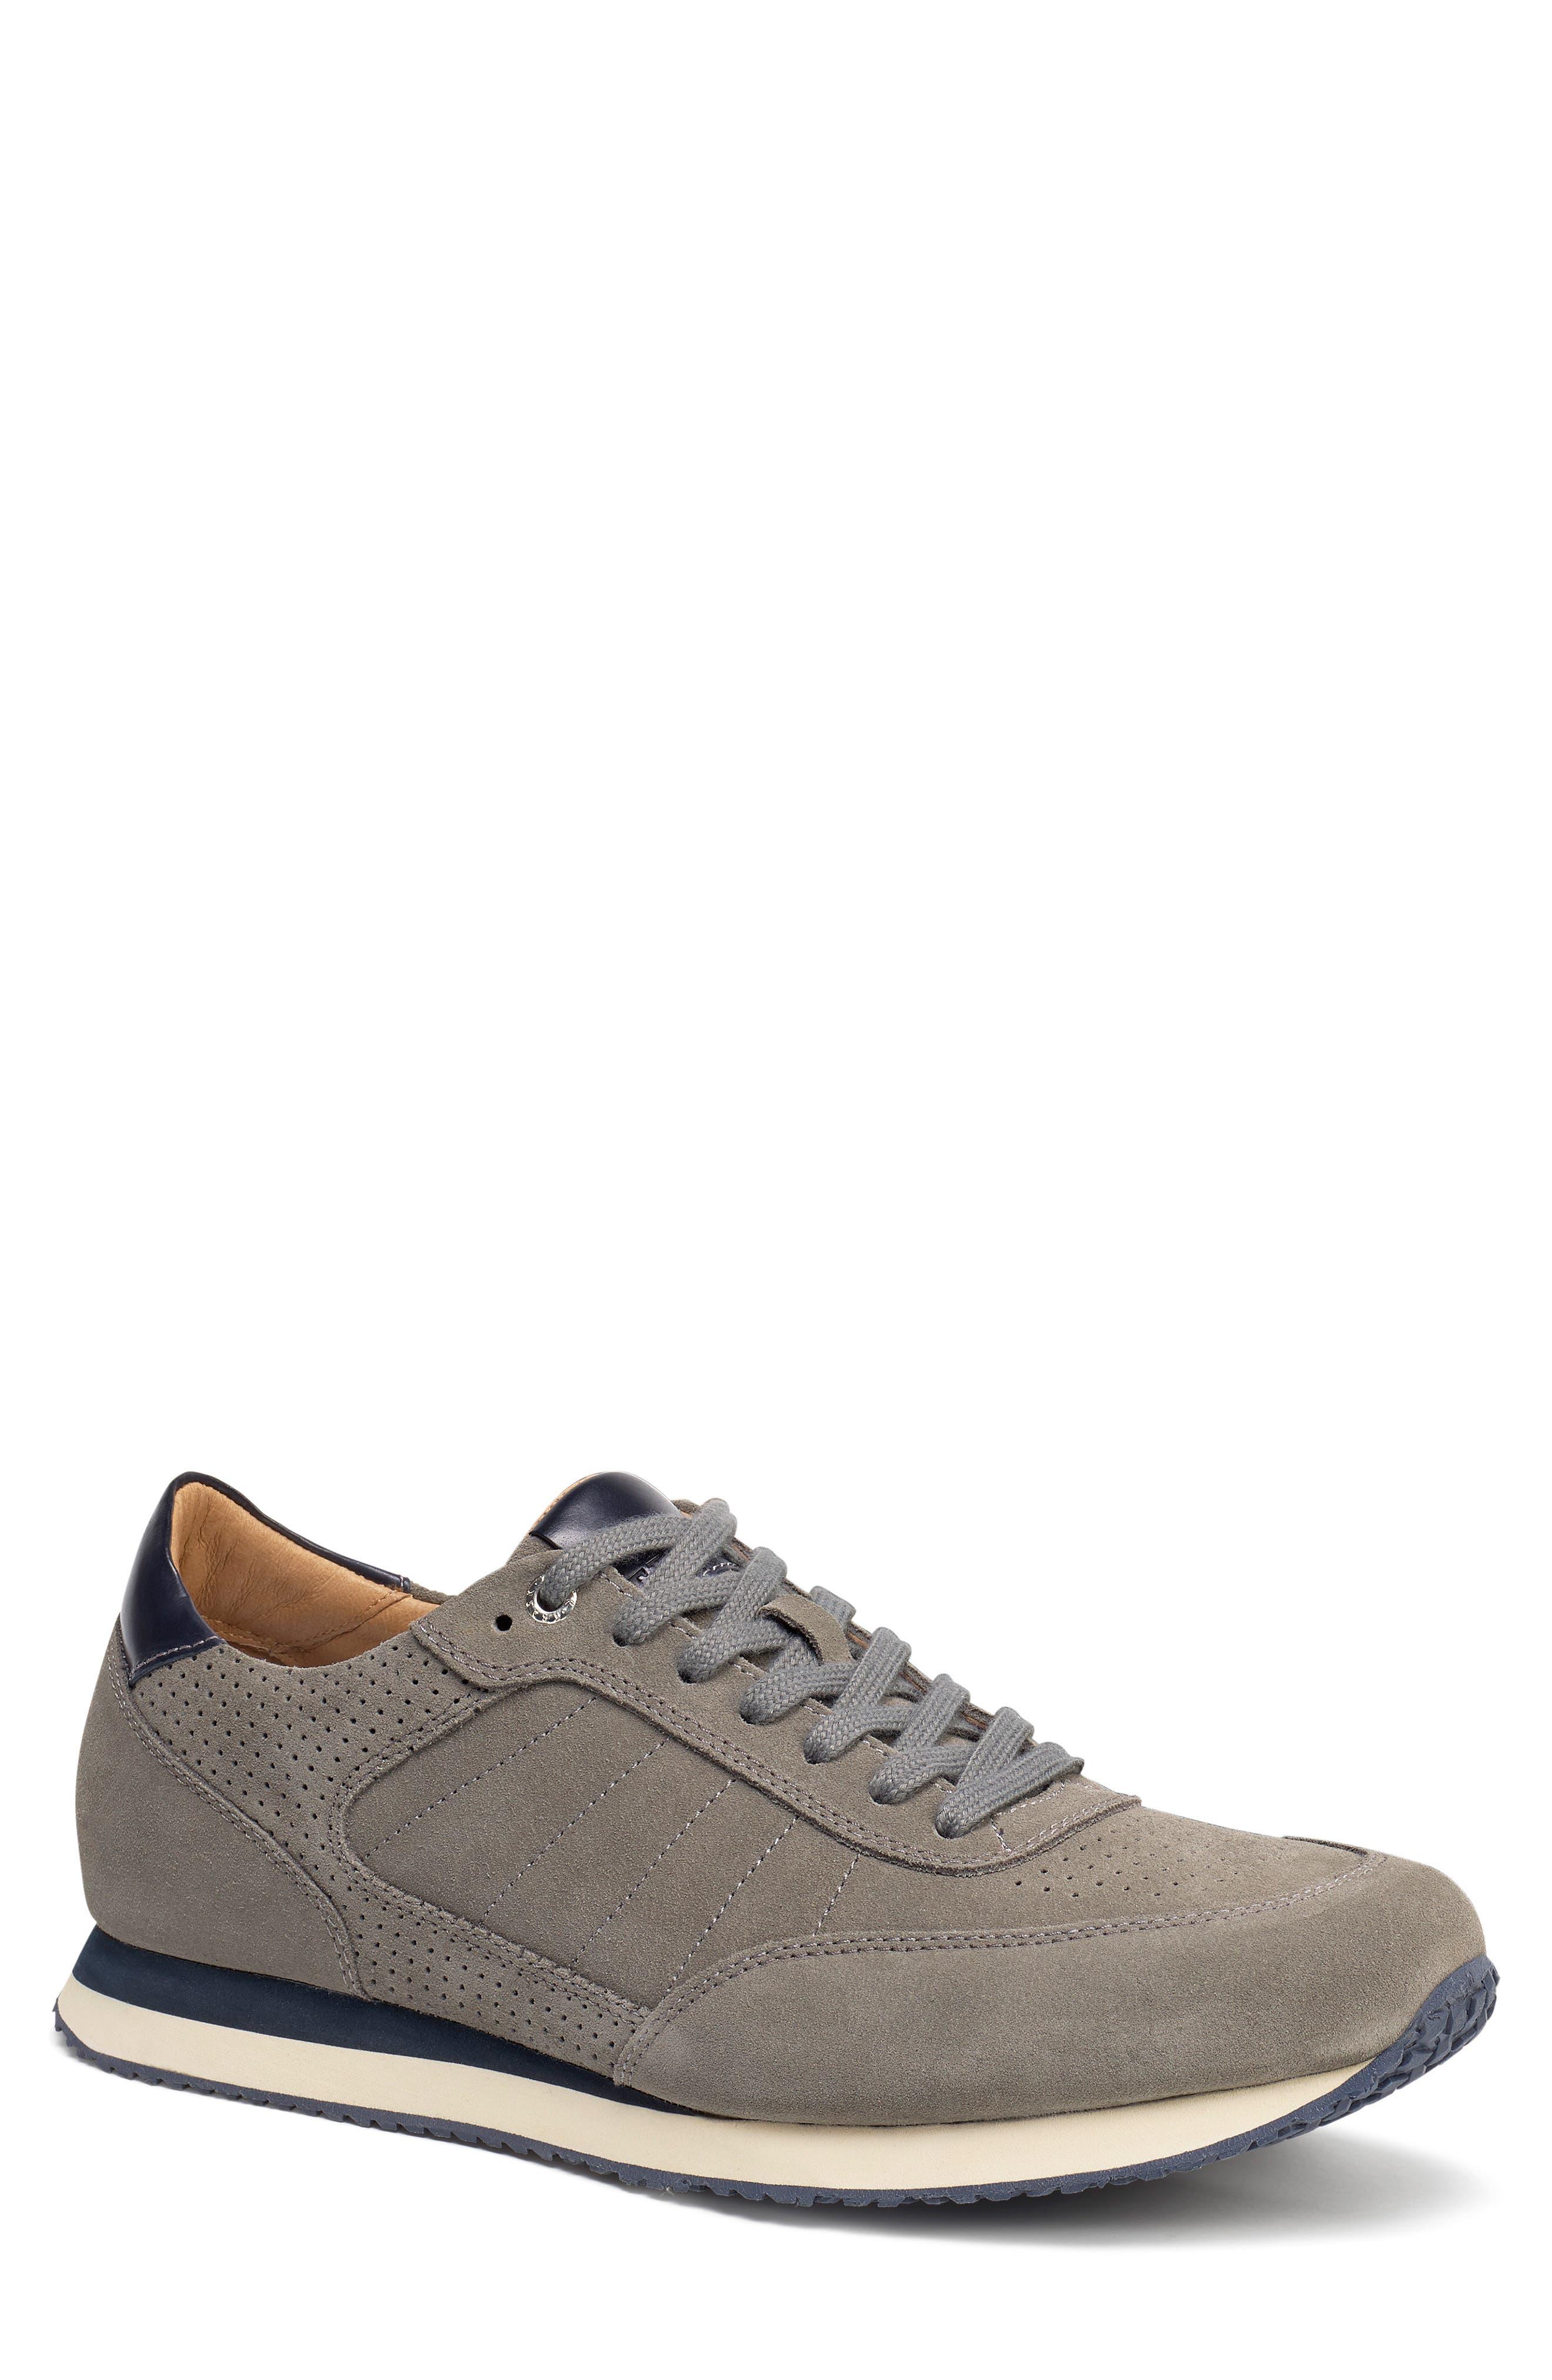 Aiden Sneaker,                             Main thumbnail 1, color,                             GREY SUEDE